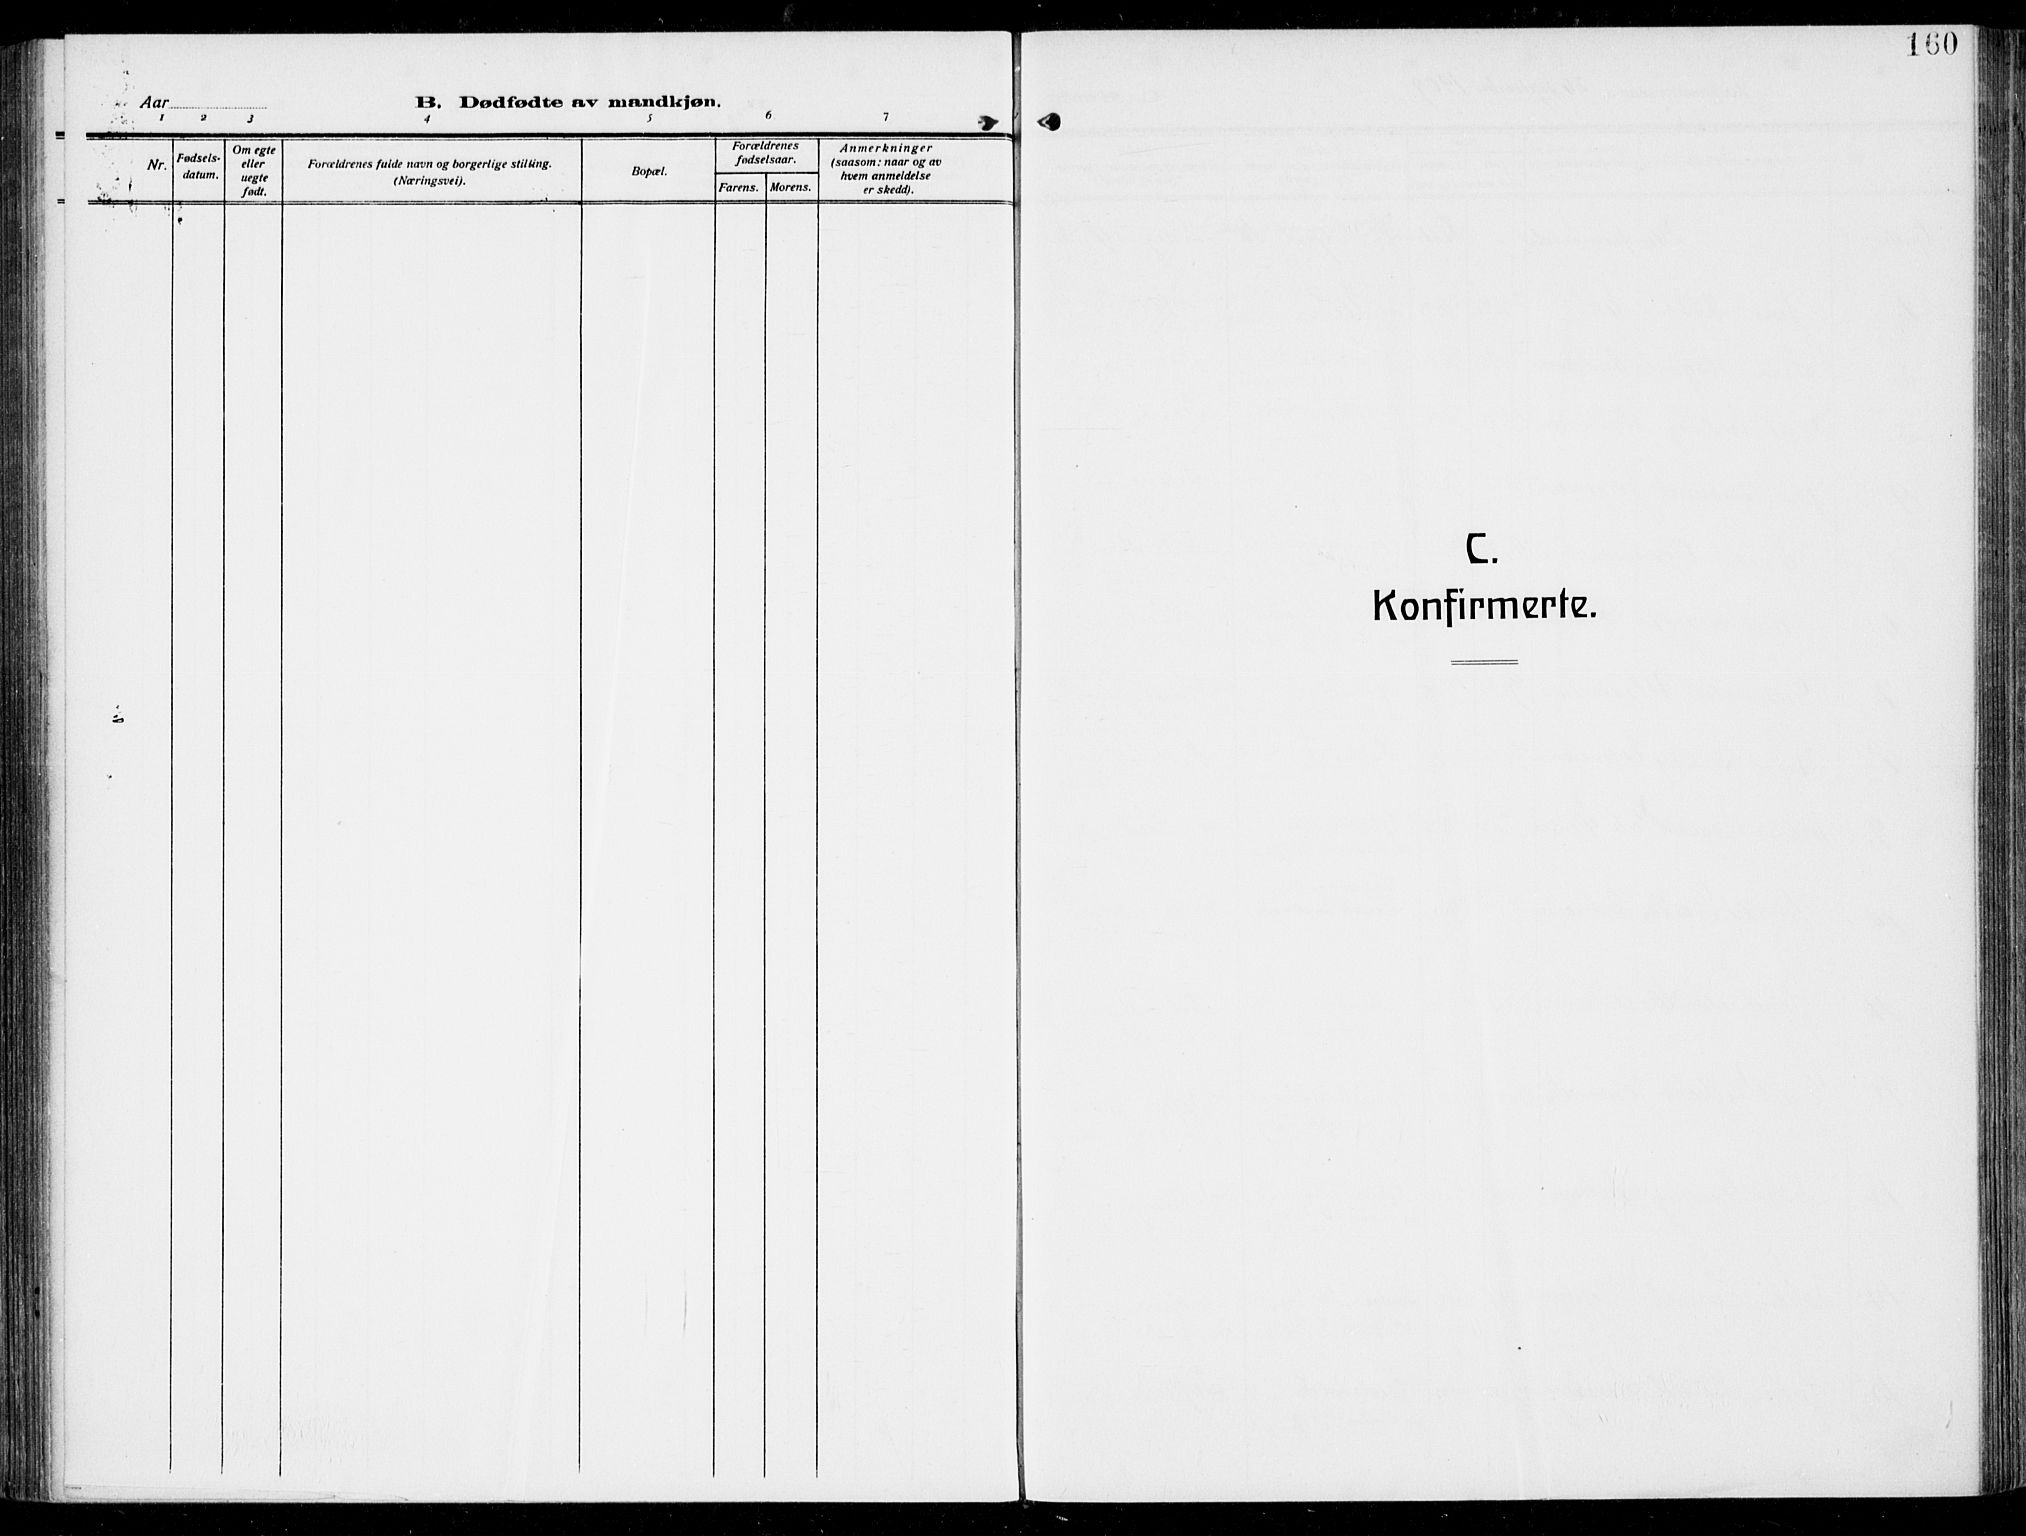 SAKO, Hurum kirkebøker, F/Fa/L0016: Ministerialbok nr. 16, 1899-1918, s. 160